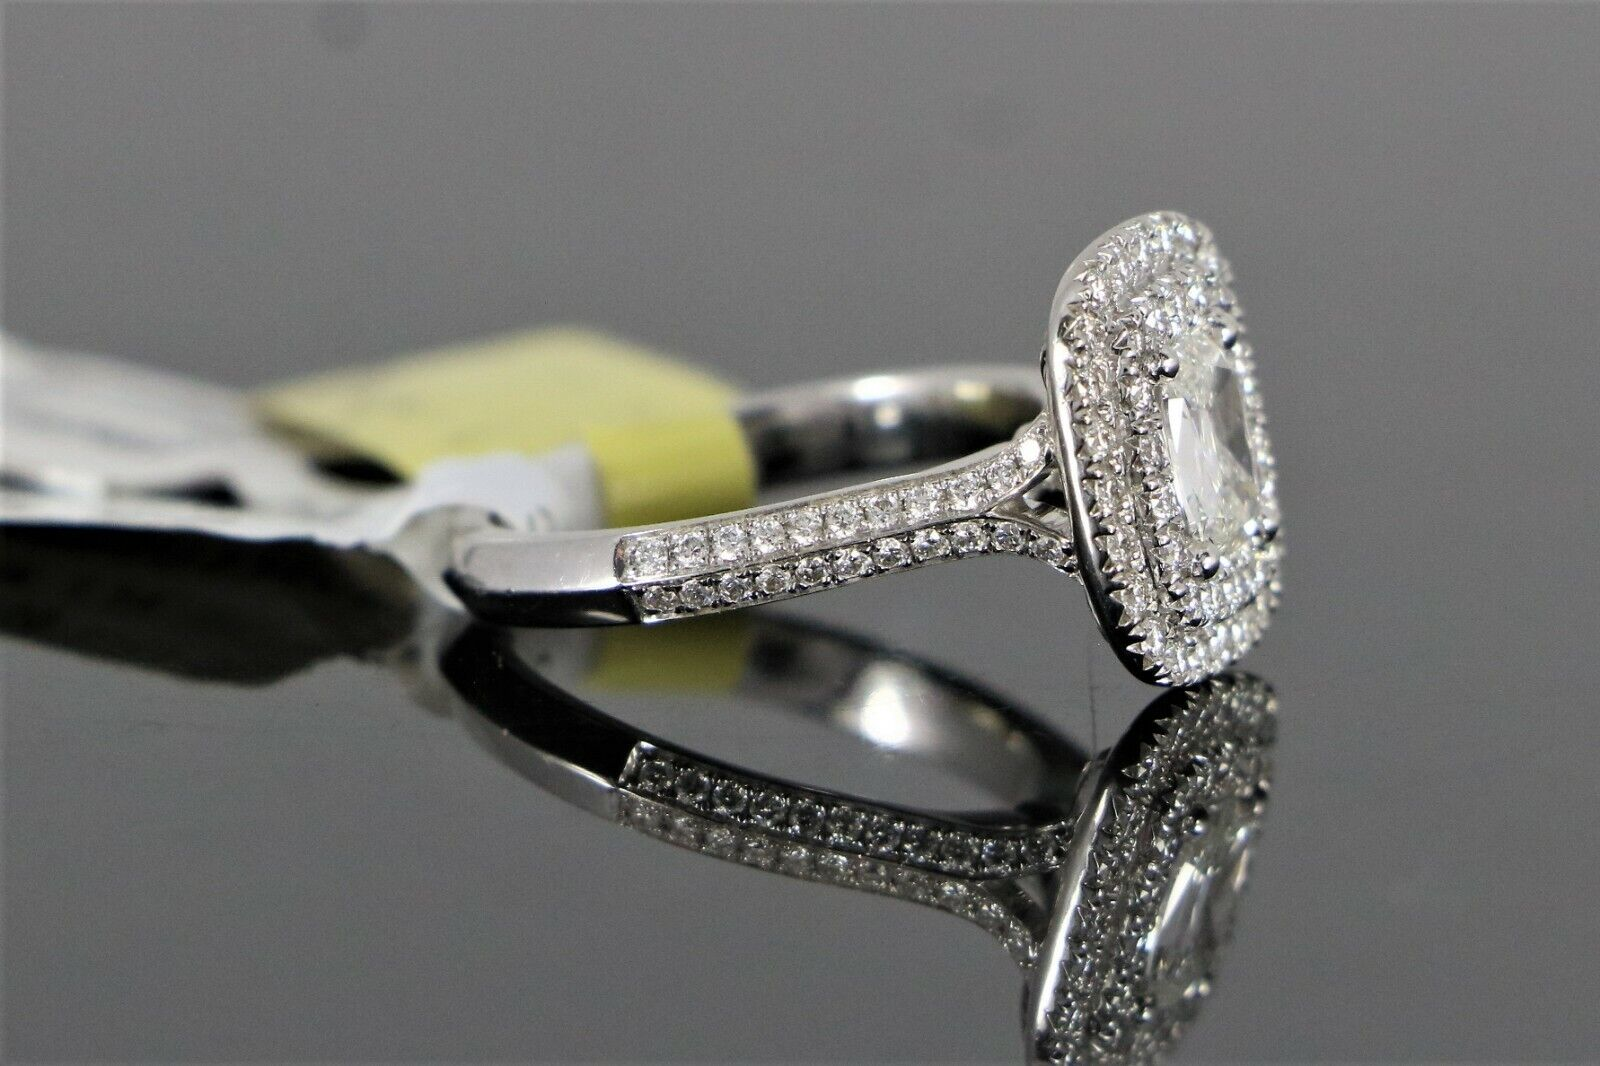 $5,150 S&S 14K White Gold 1.14ct GIA SI2 Cushion Diamond Halo Engagement Ring 6 7